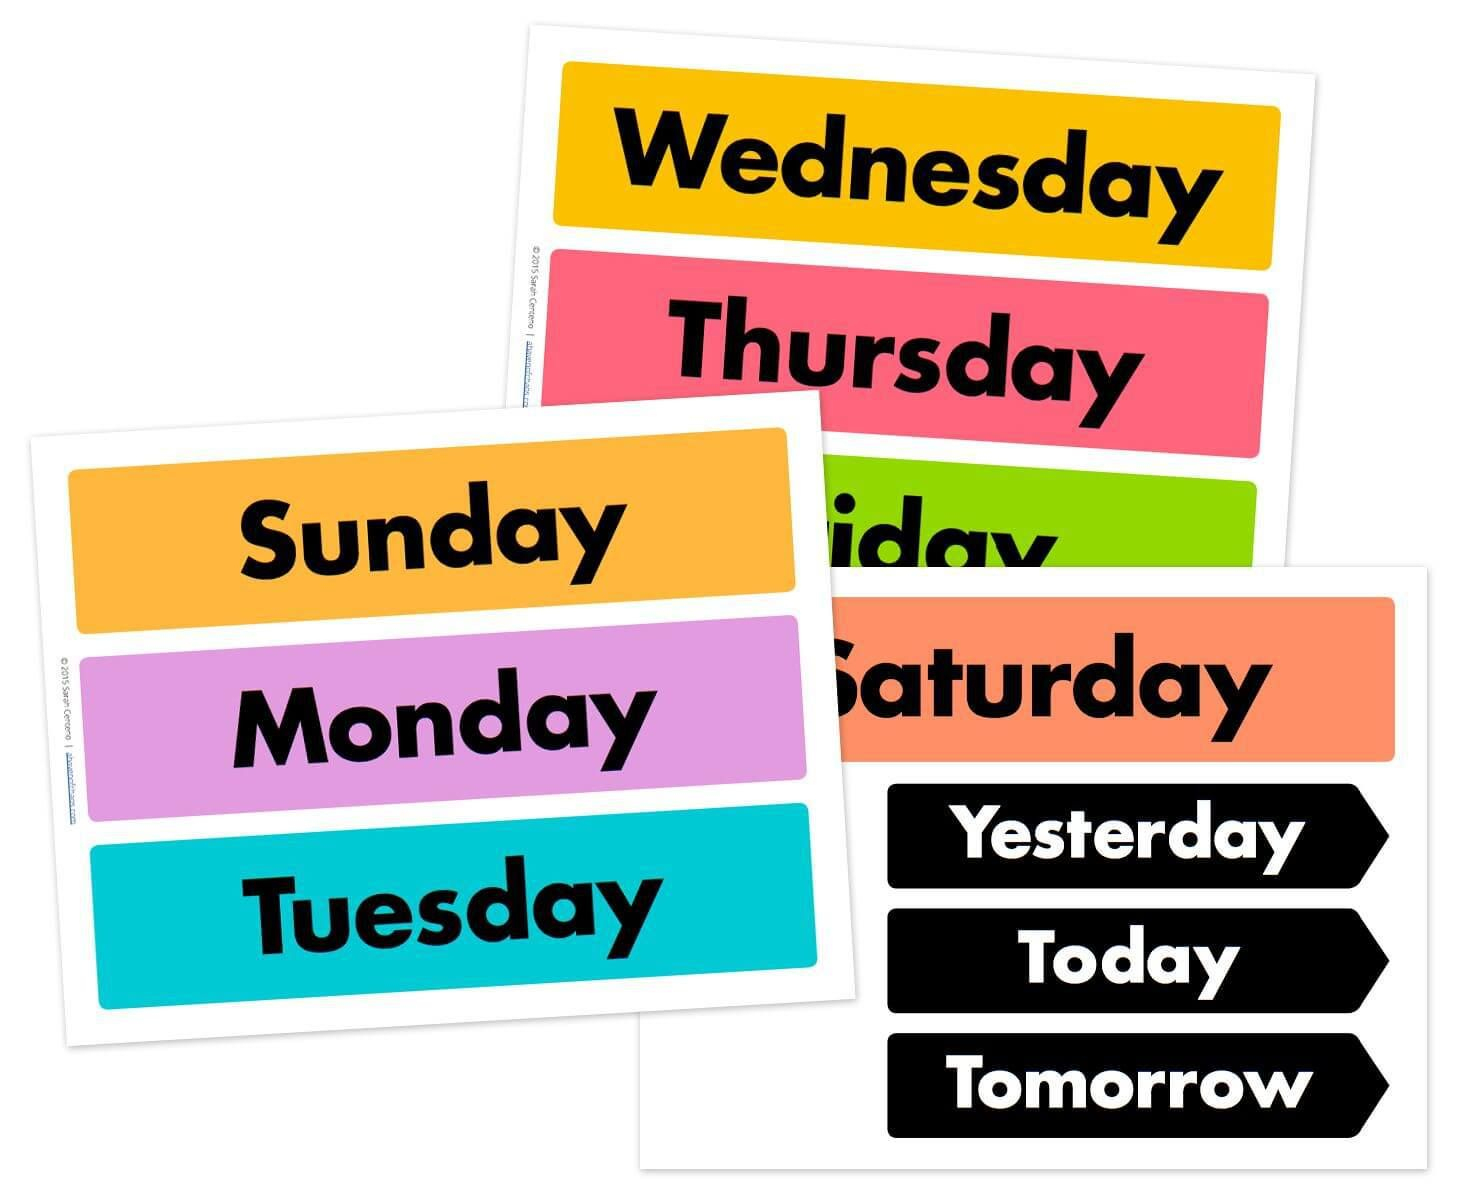 Days Of The Week Printable Free   Free Calendar Cards And Monthly - Free Printable Days Of The Week